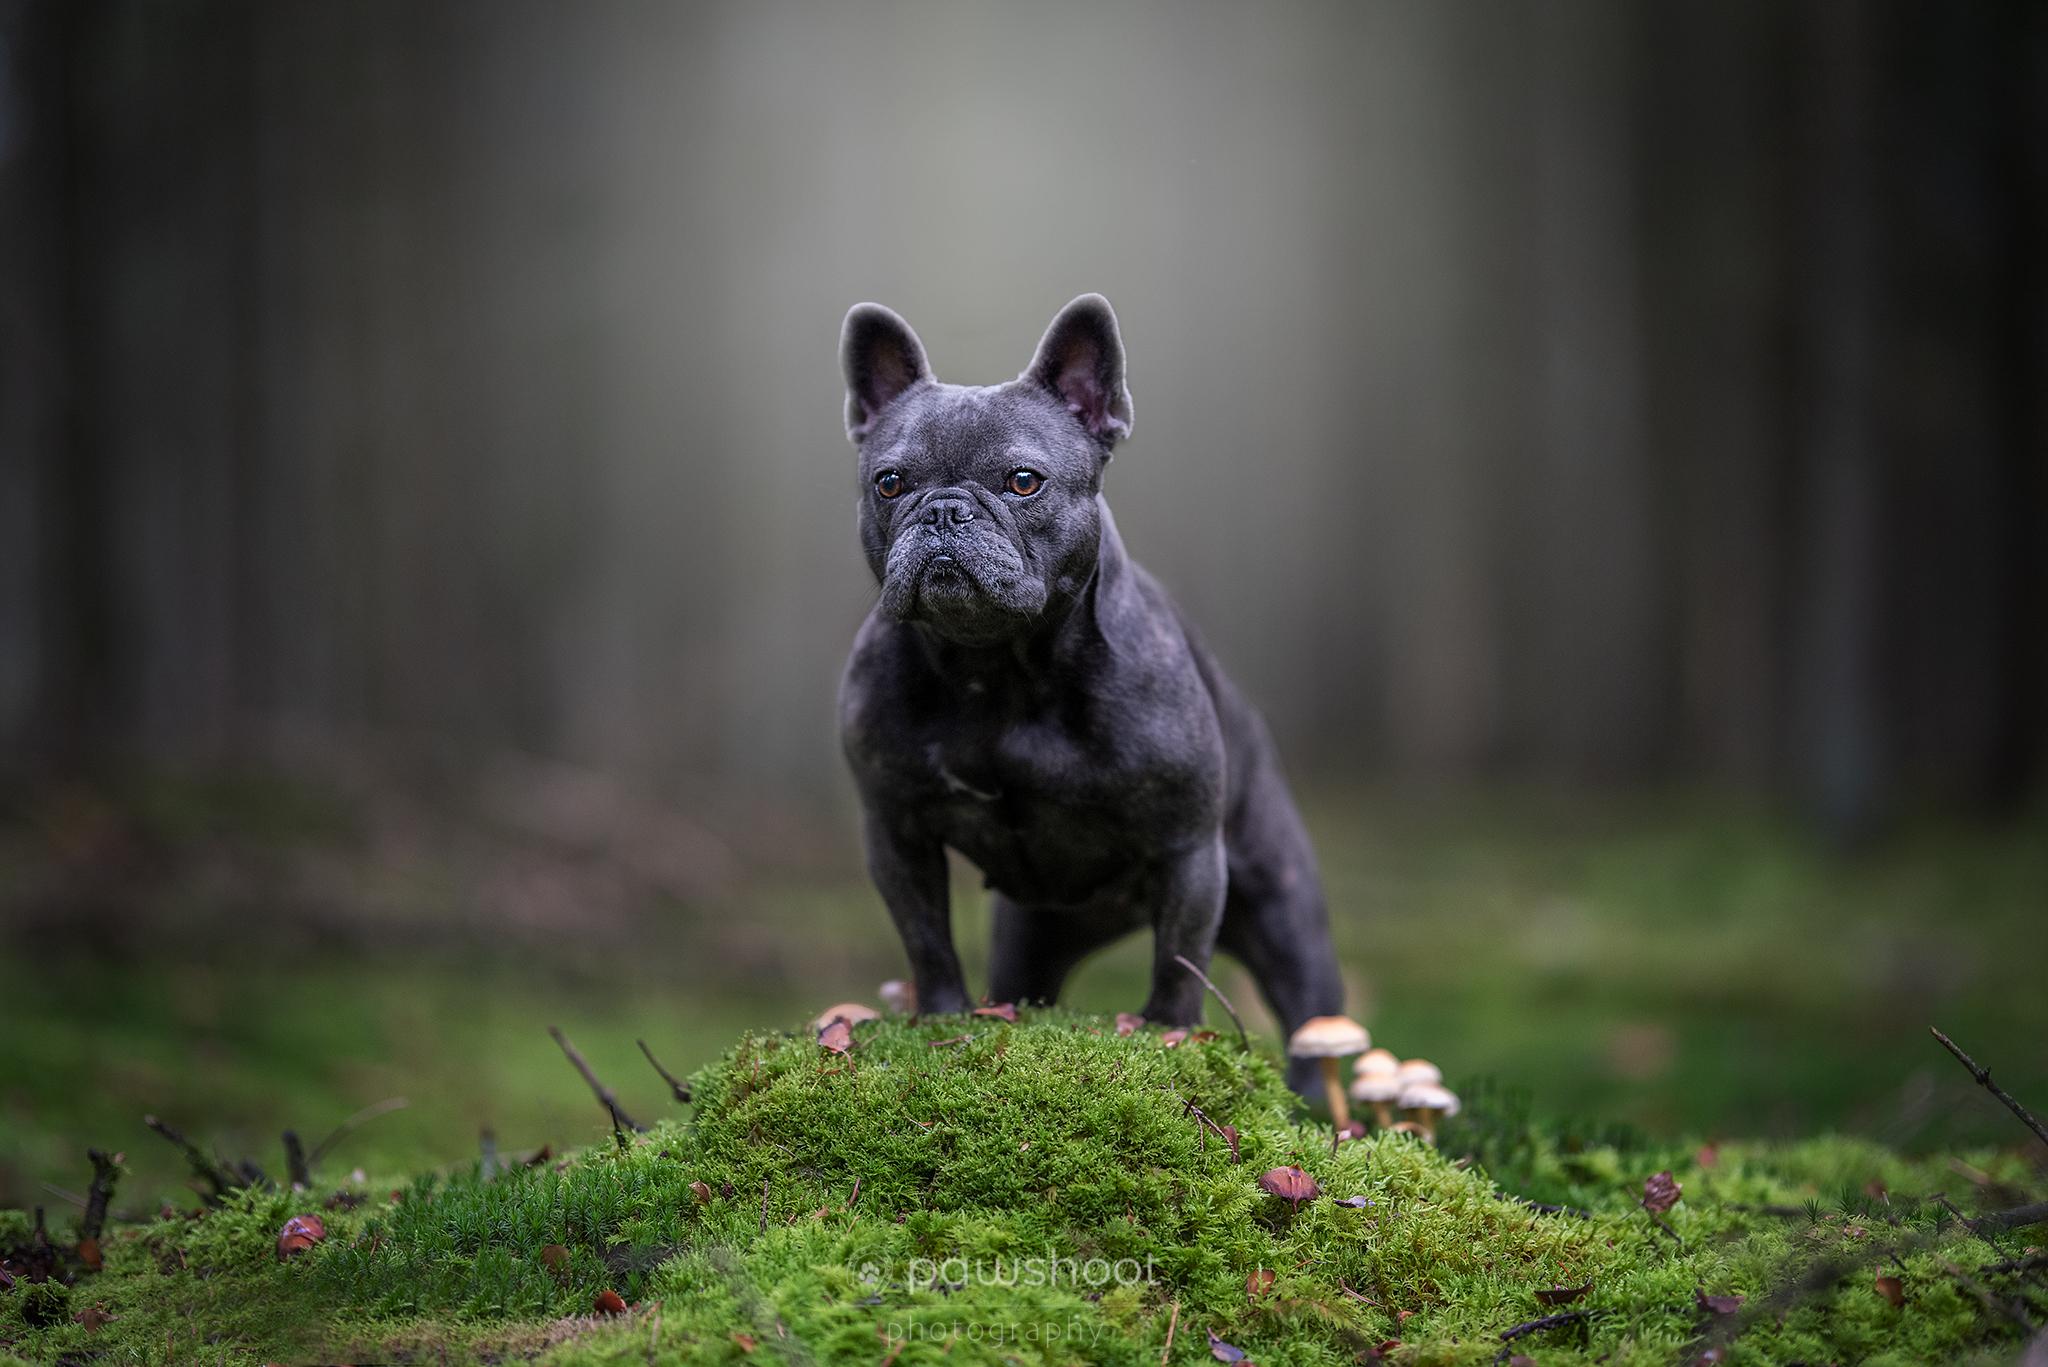 Franse buldog poseert Pawshoot hondenfotografie